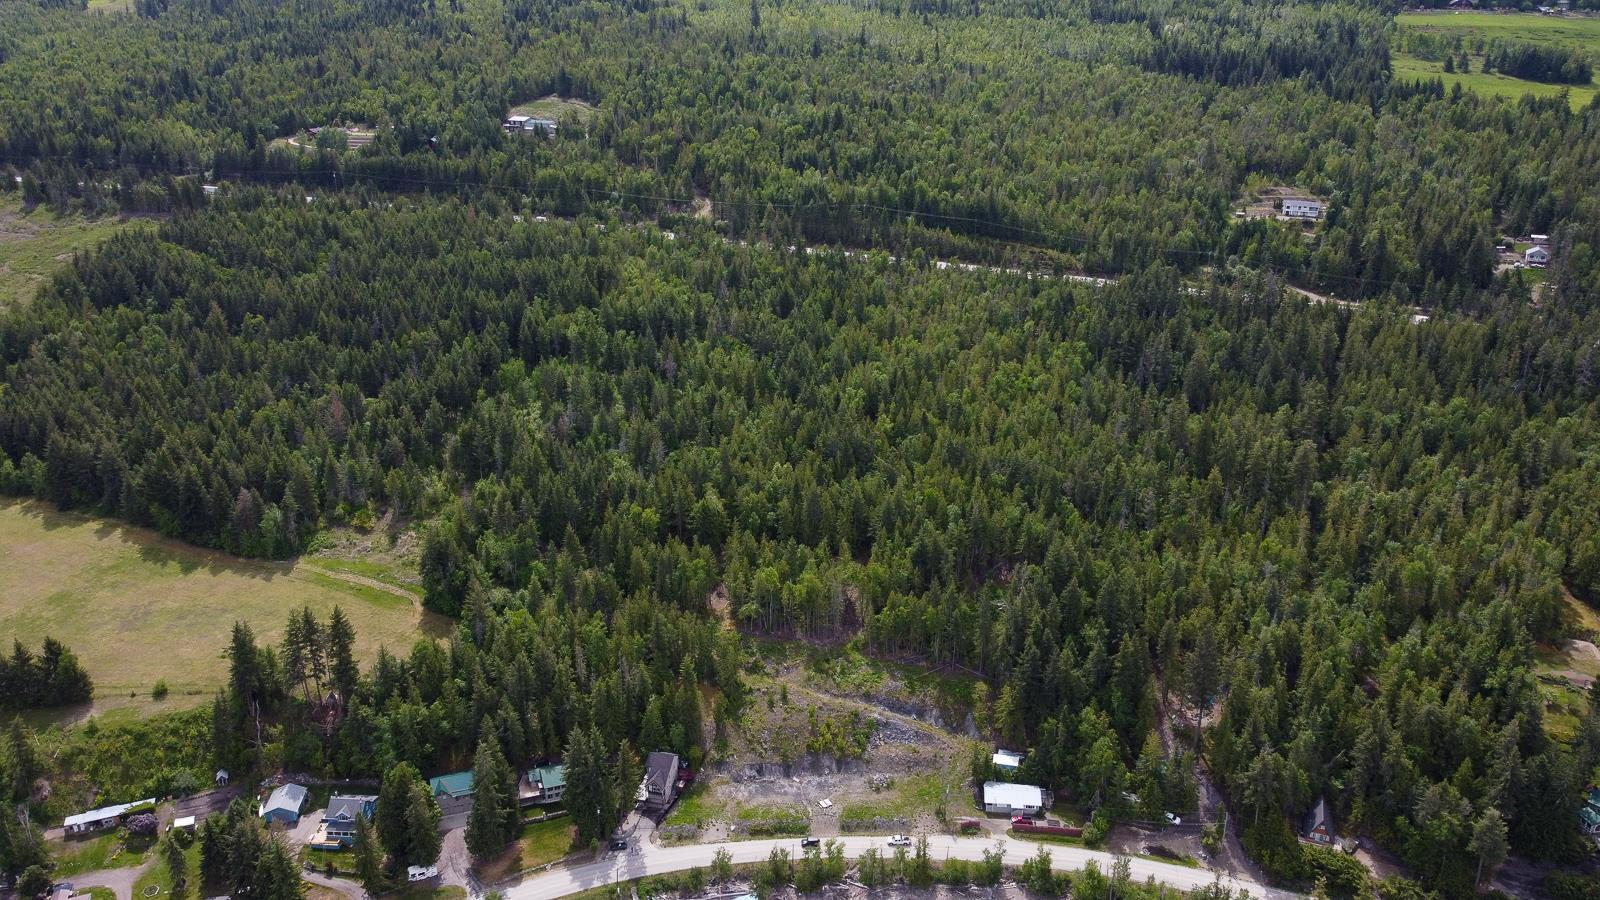 Lot 1-5 Blind Bay Road,, Blind Bay, British Columbia  V0E 1H0 - Photo 20 - 10232466